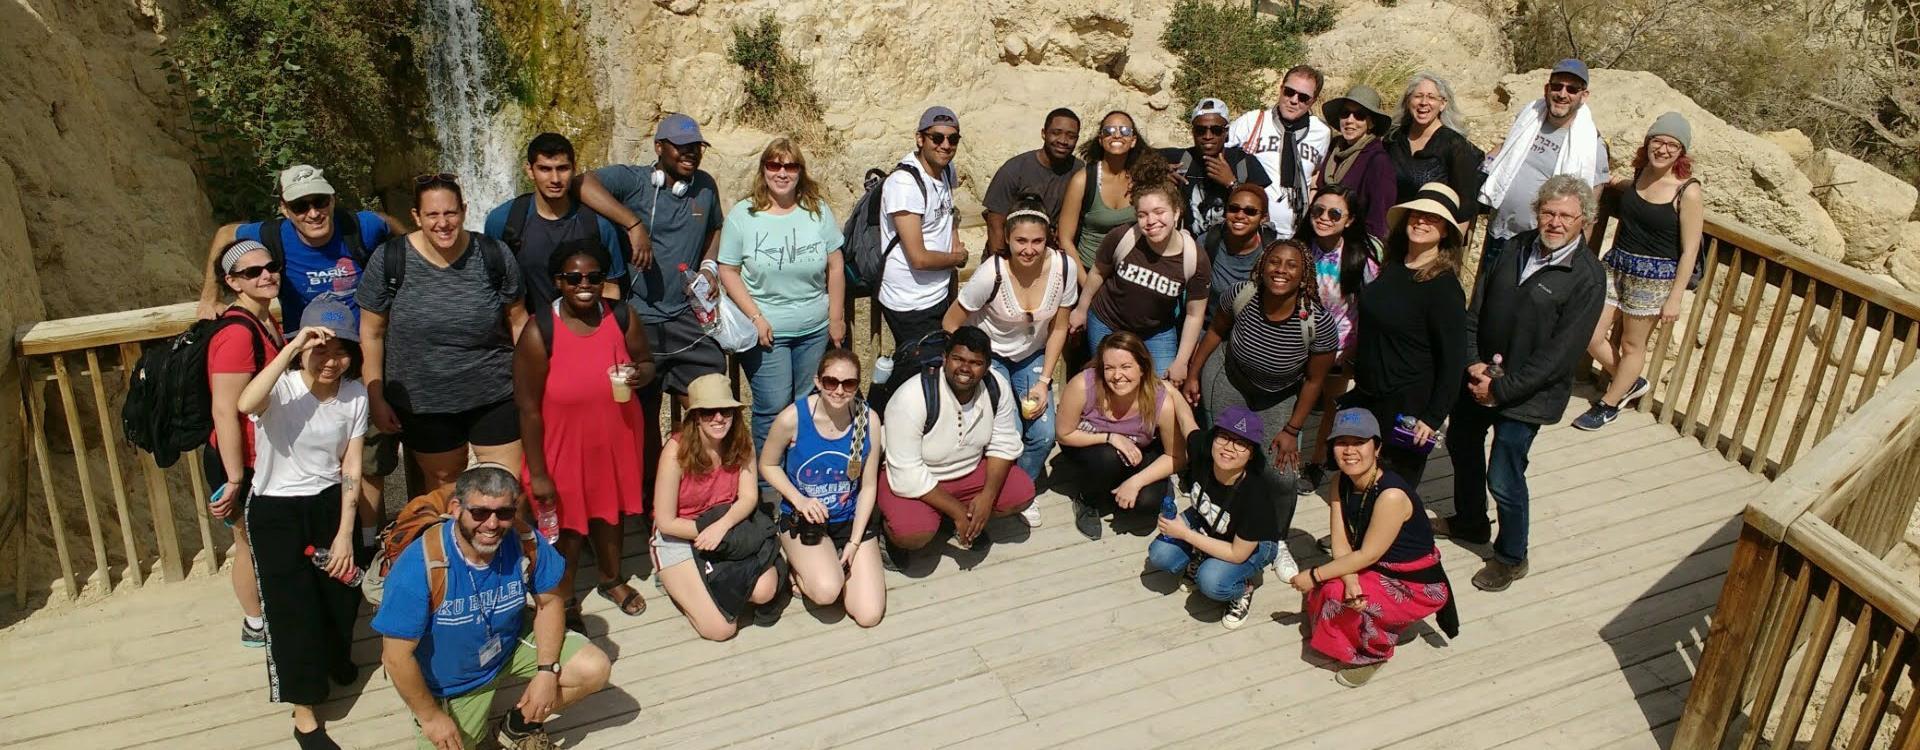 2019 Trip to Israel-Palestine Travelers hiking the Ein Gedi Oasis